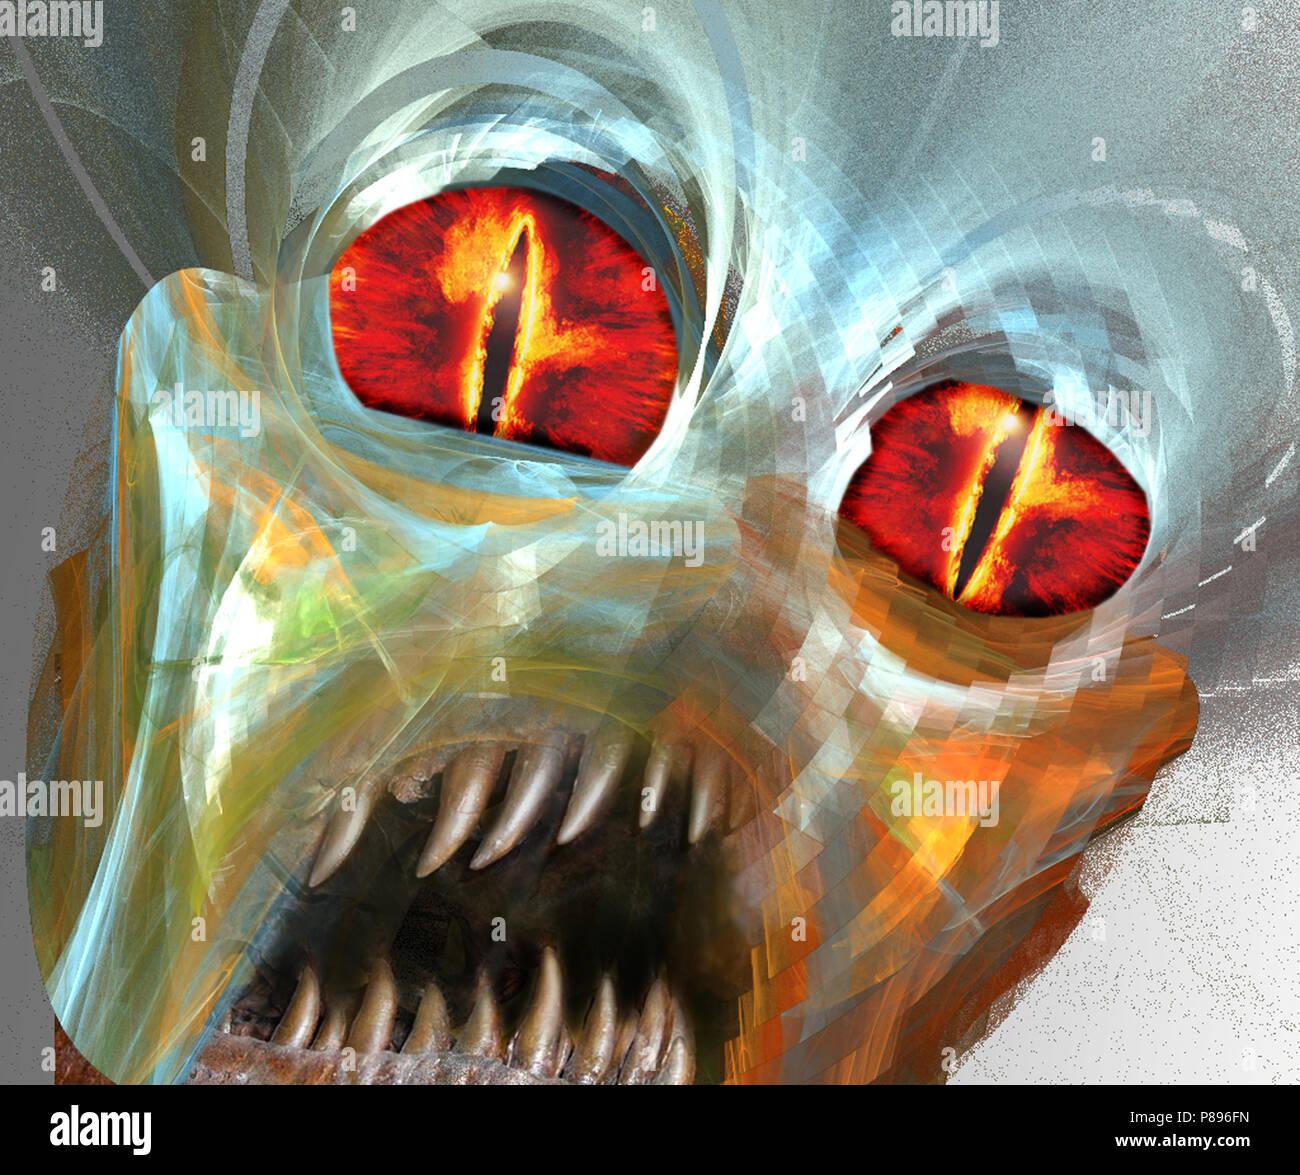 space alien illustration - Stock Image